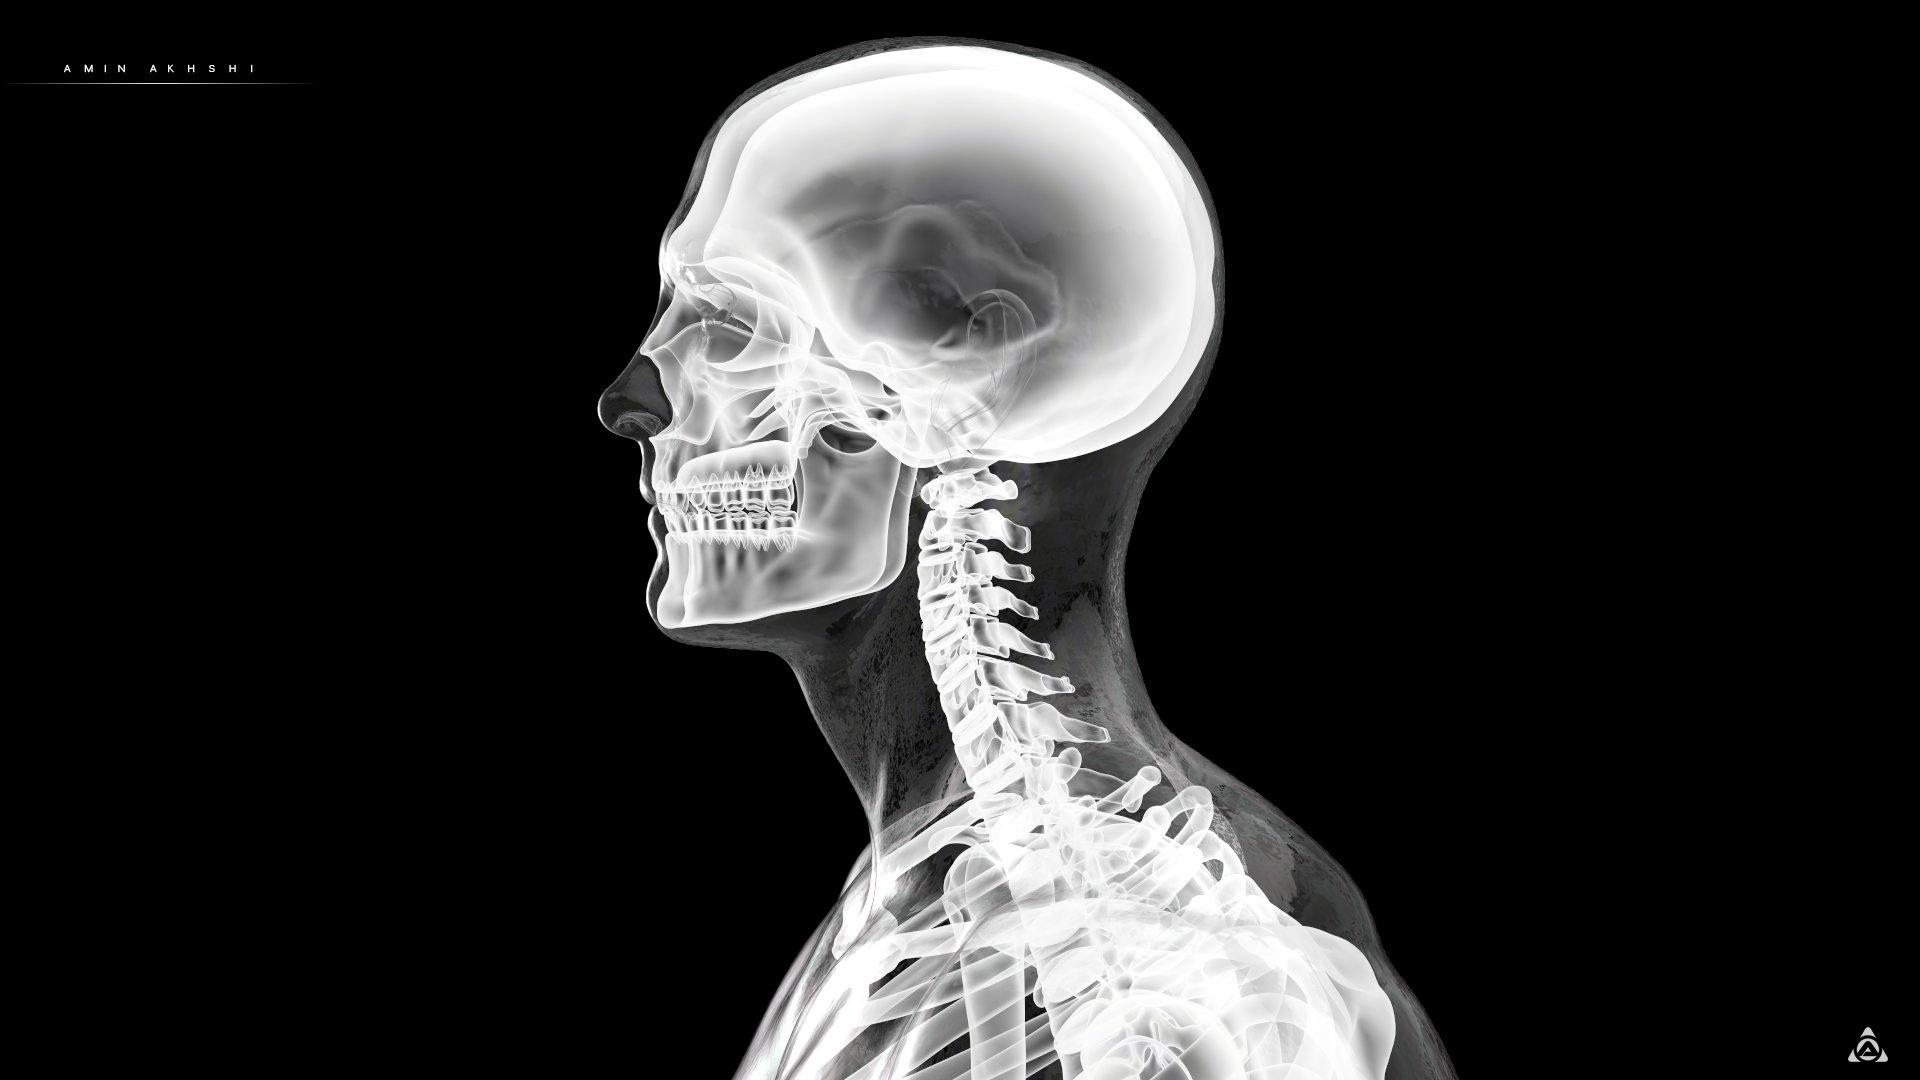 Amin akhshi anatomy x ray side